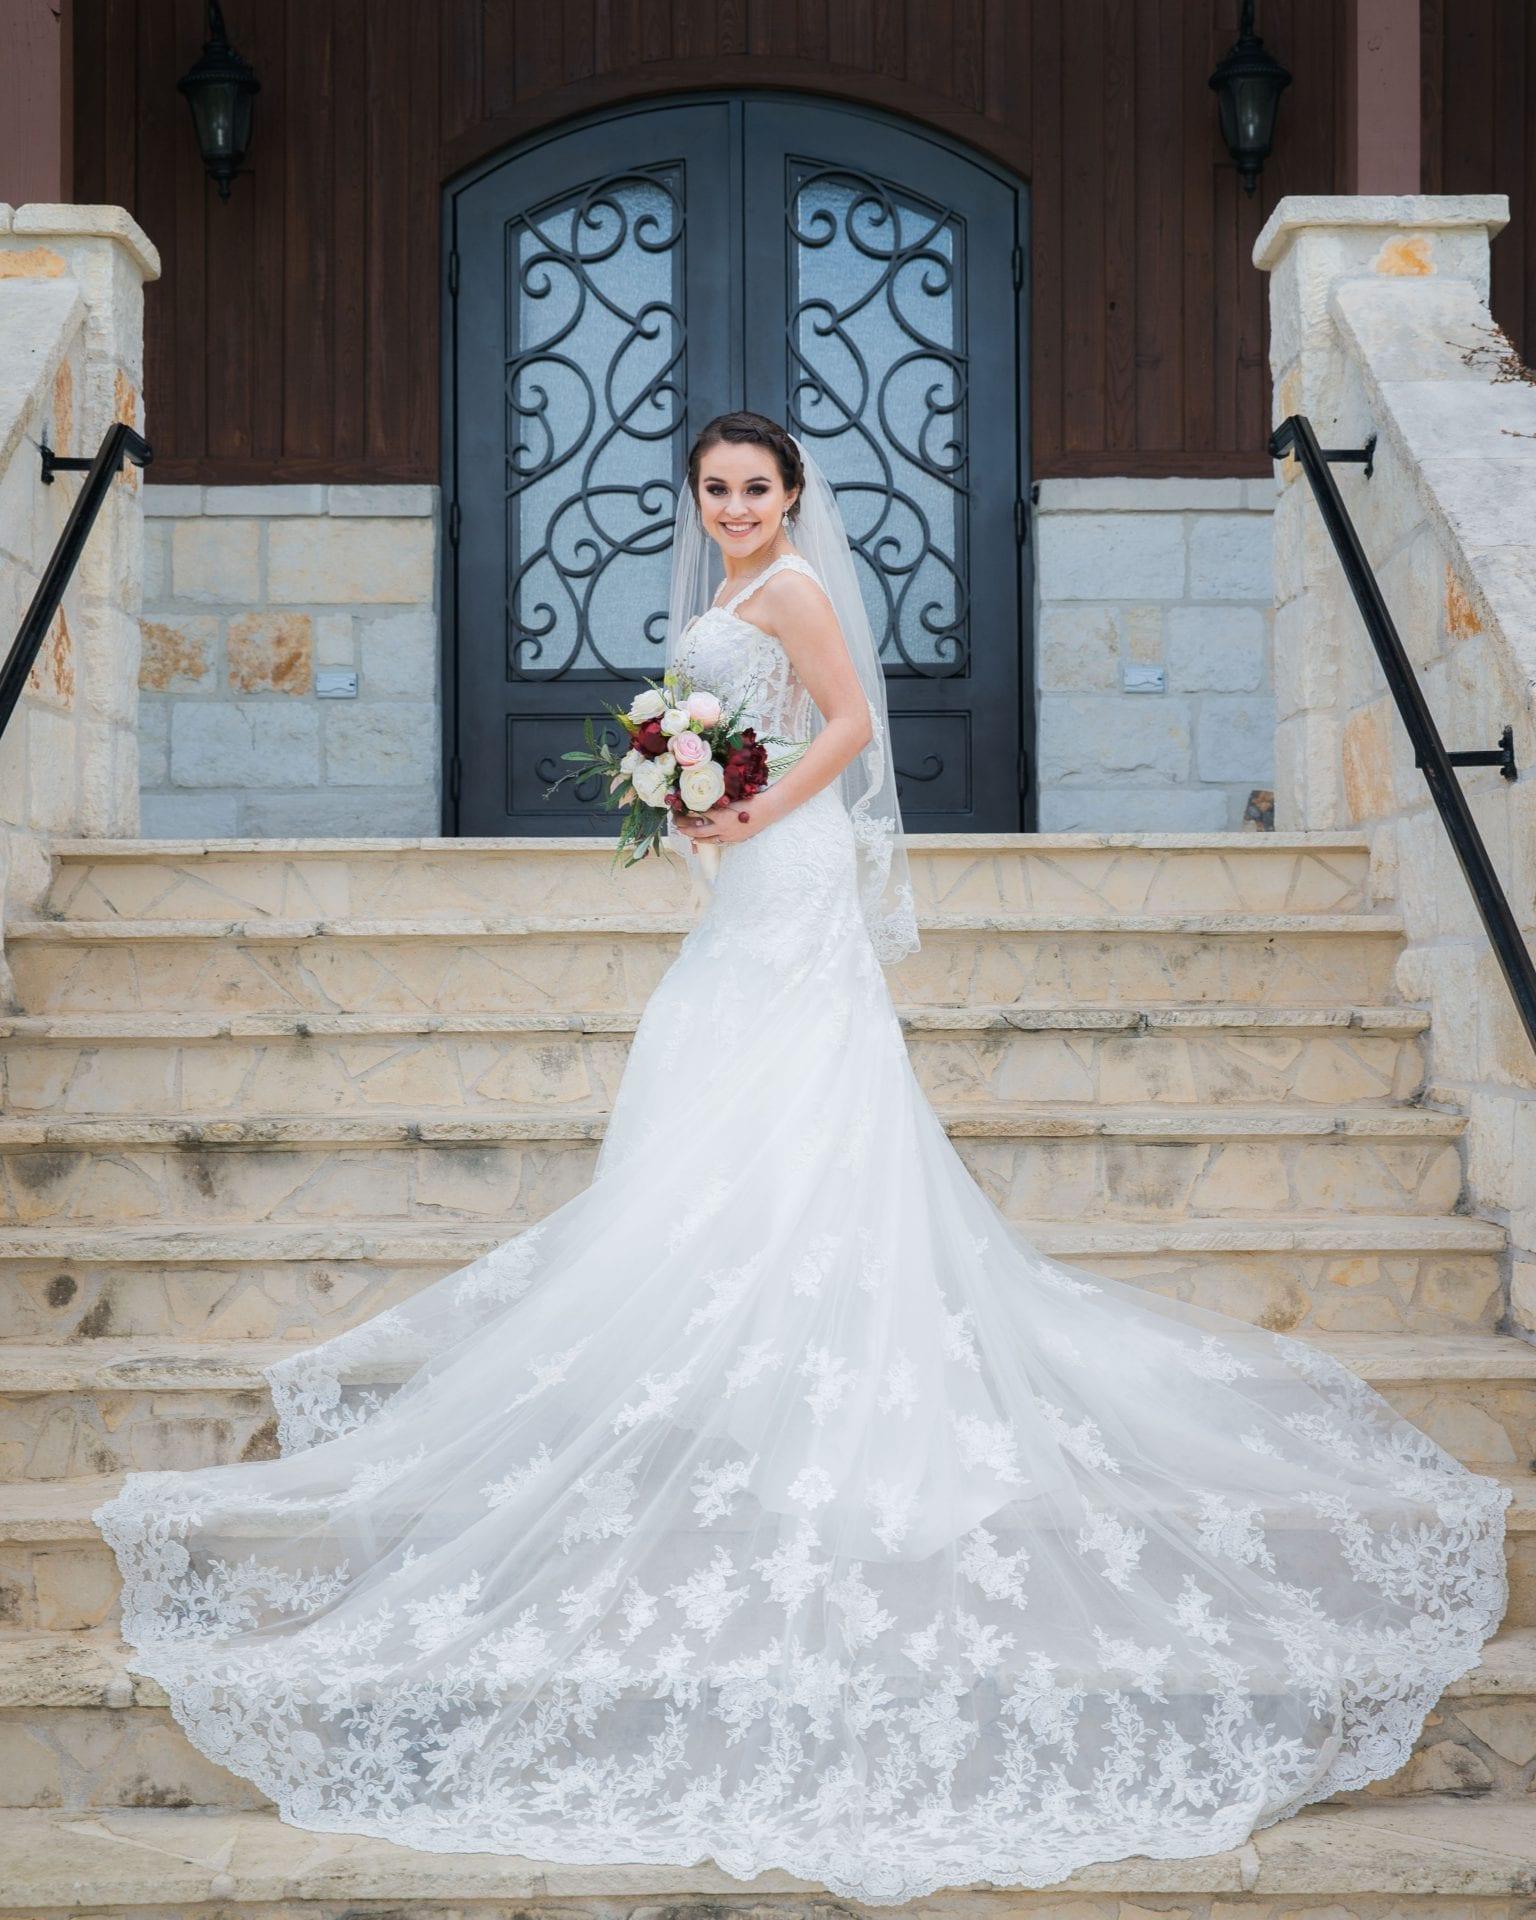 AmberLynn's Bridal at The Milestone in New Braunfels